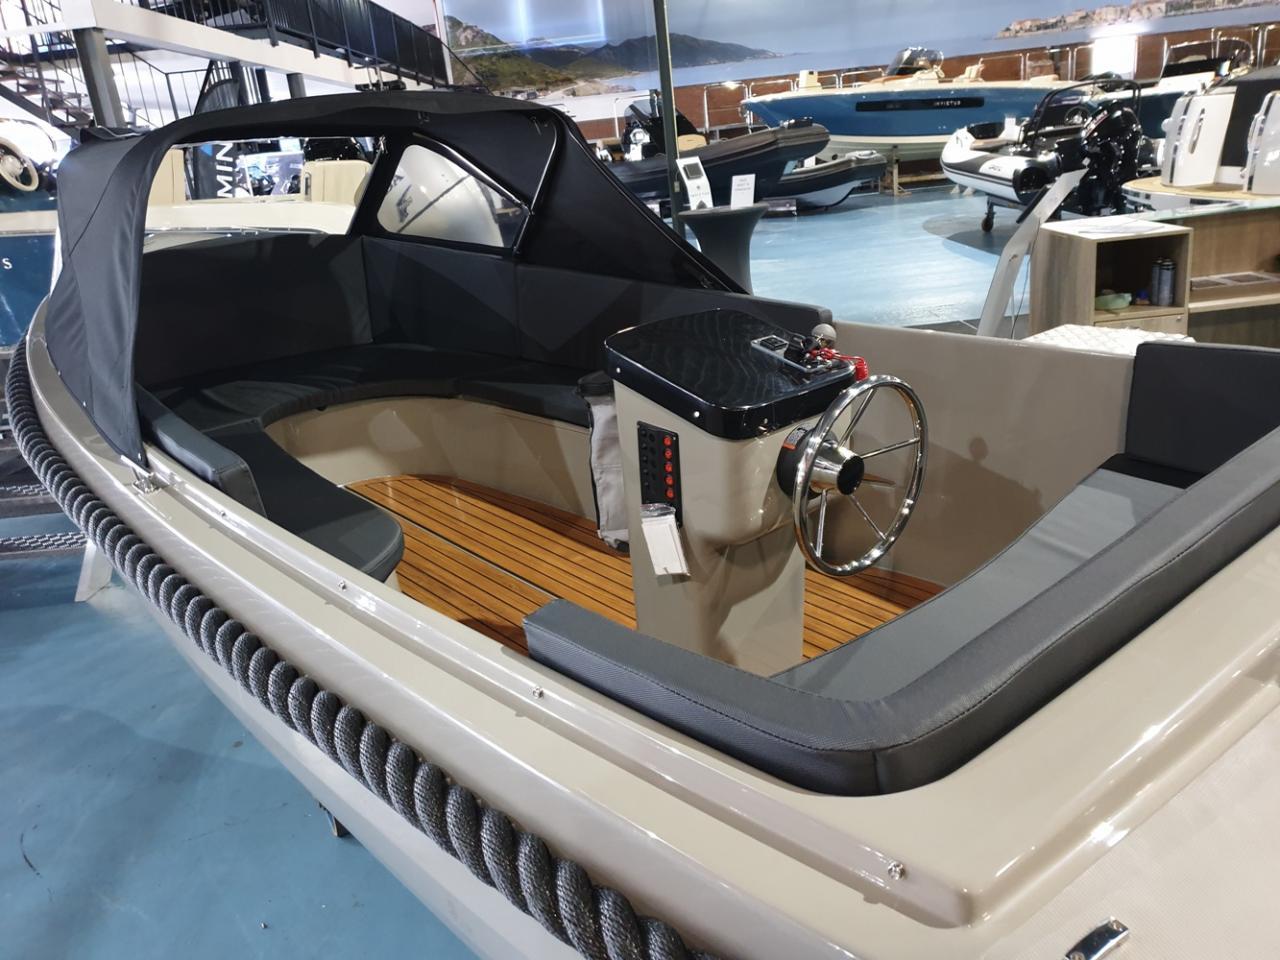 Maxima 485 met Honda 20 pk motor - levering 2022! 2